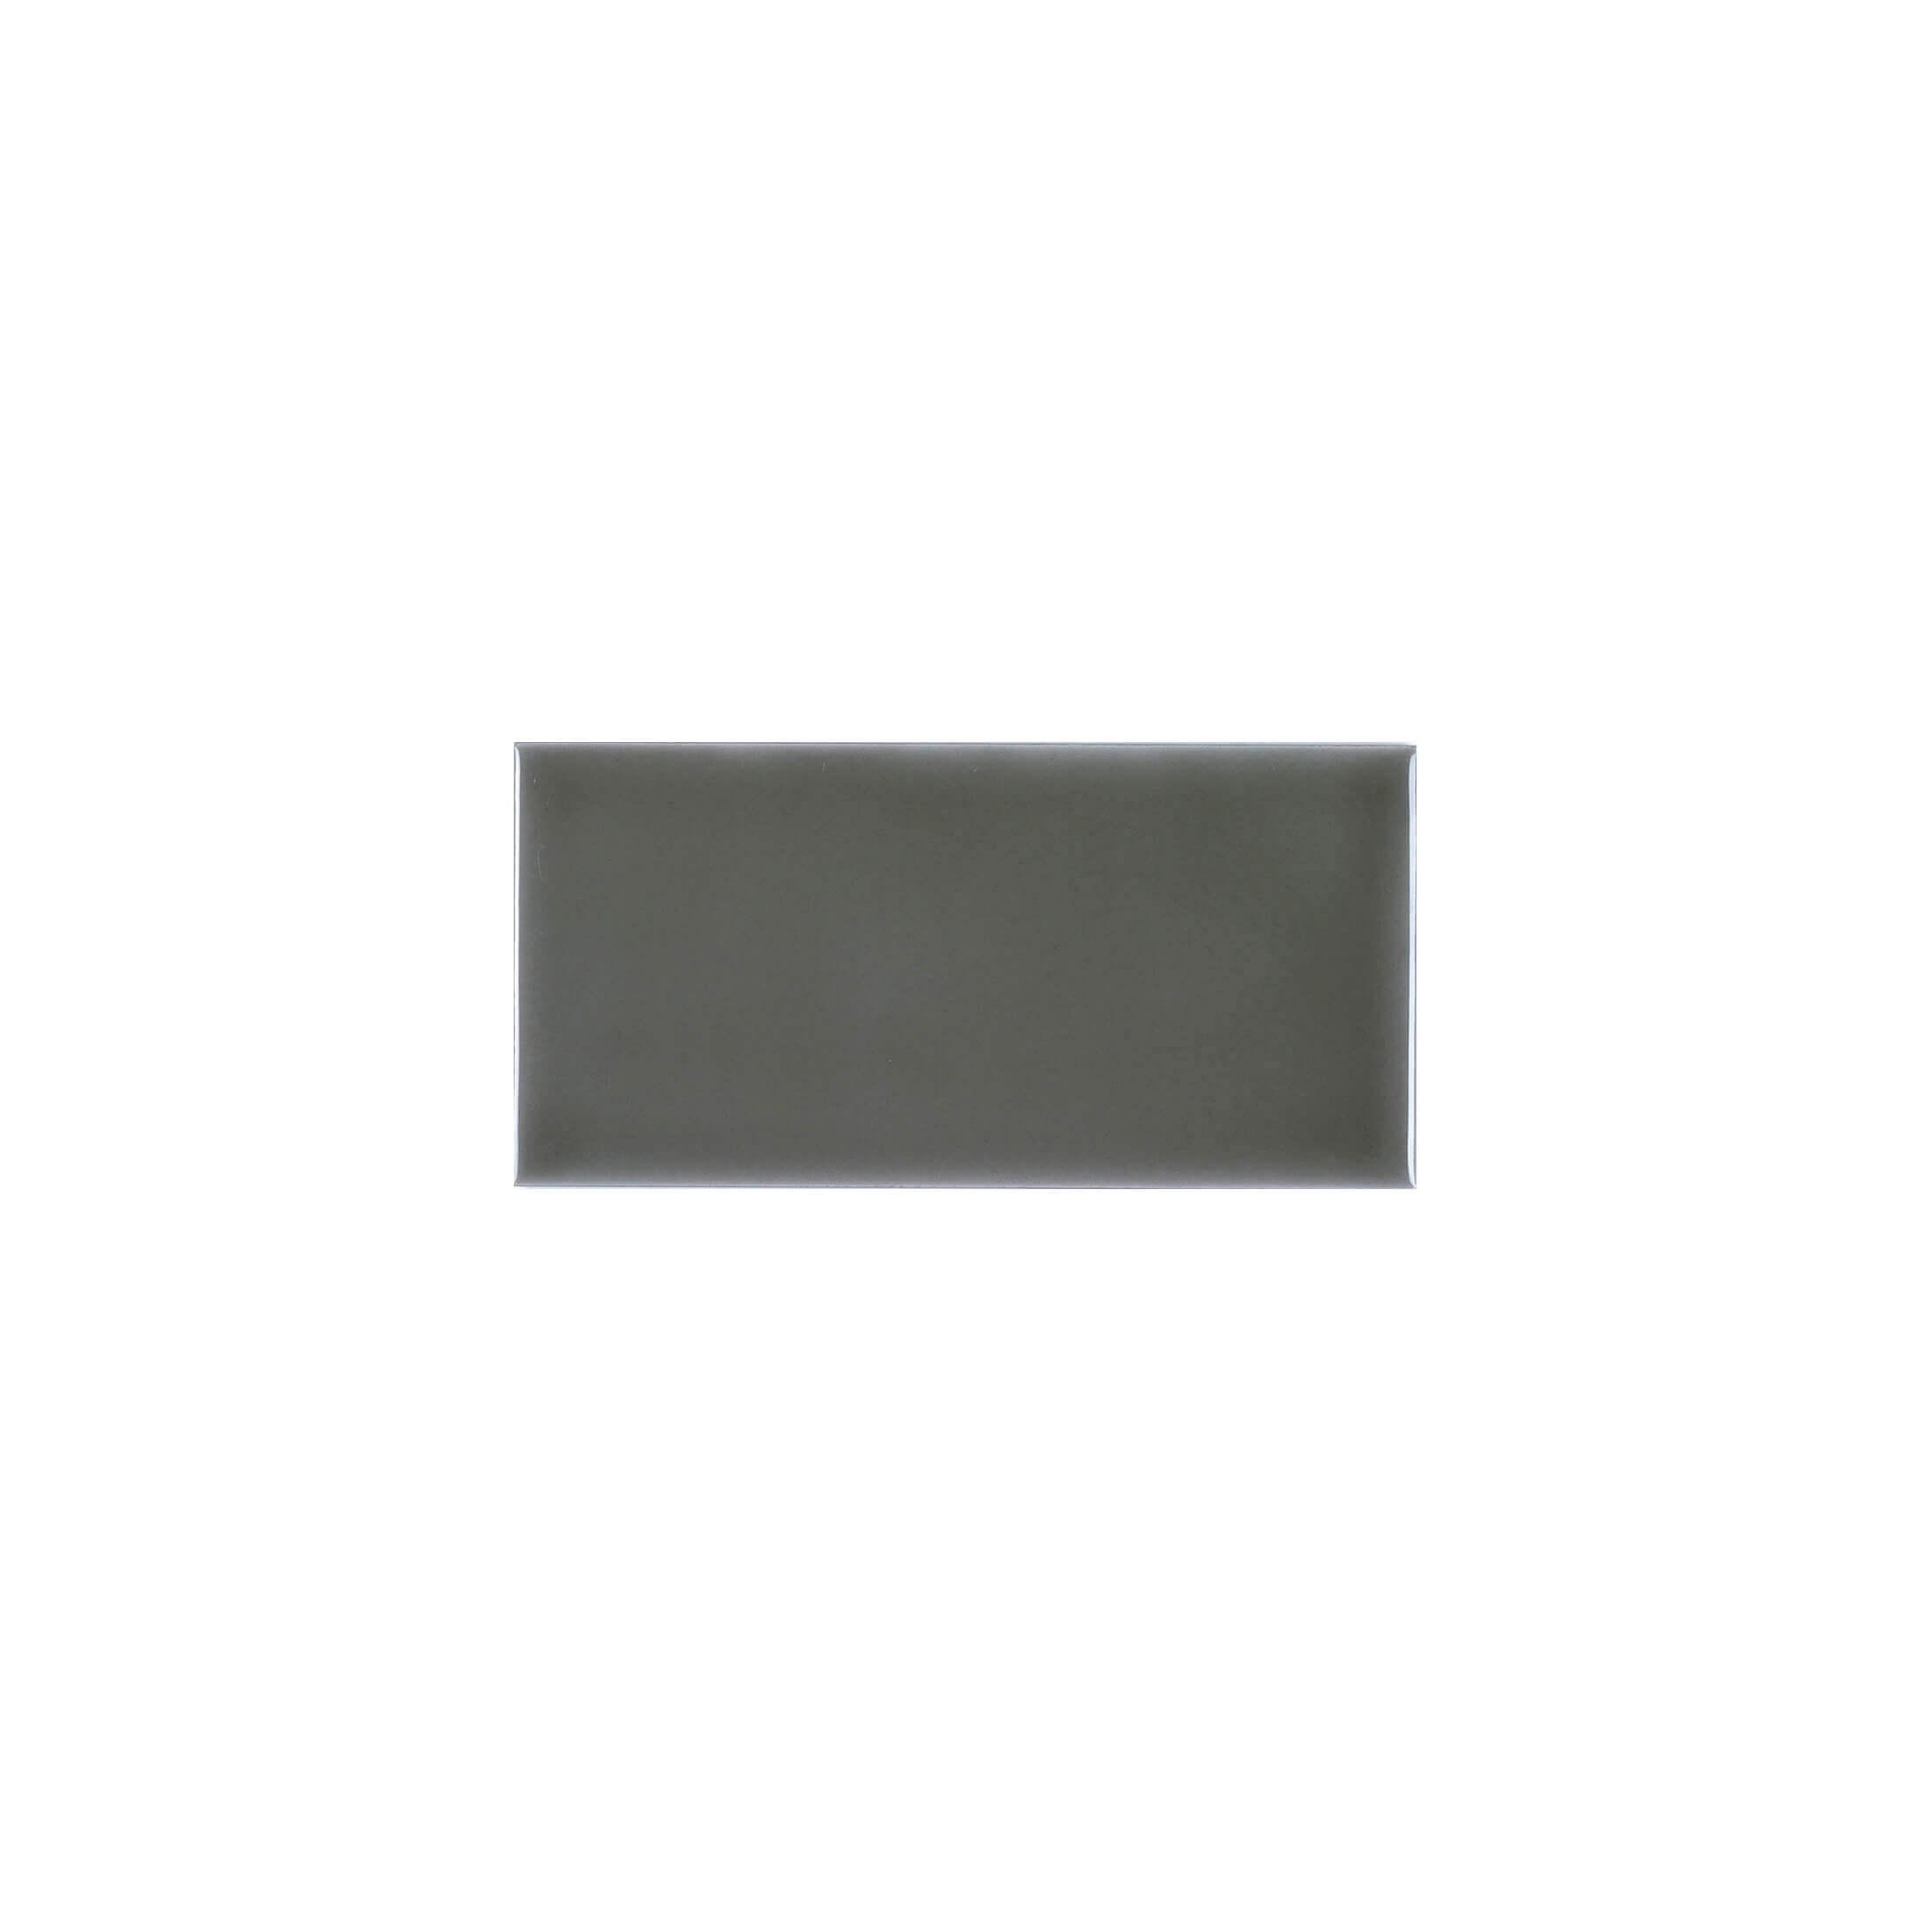 ADST1014 - LISO  - 7.3 cm X 14.8 cm